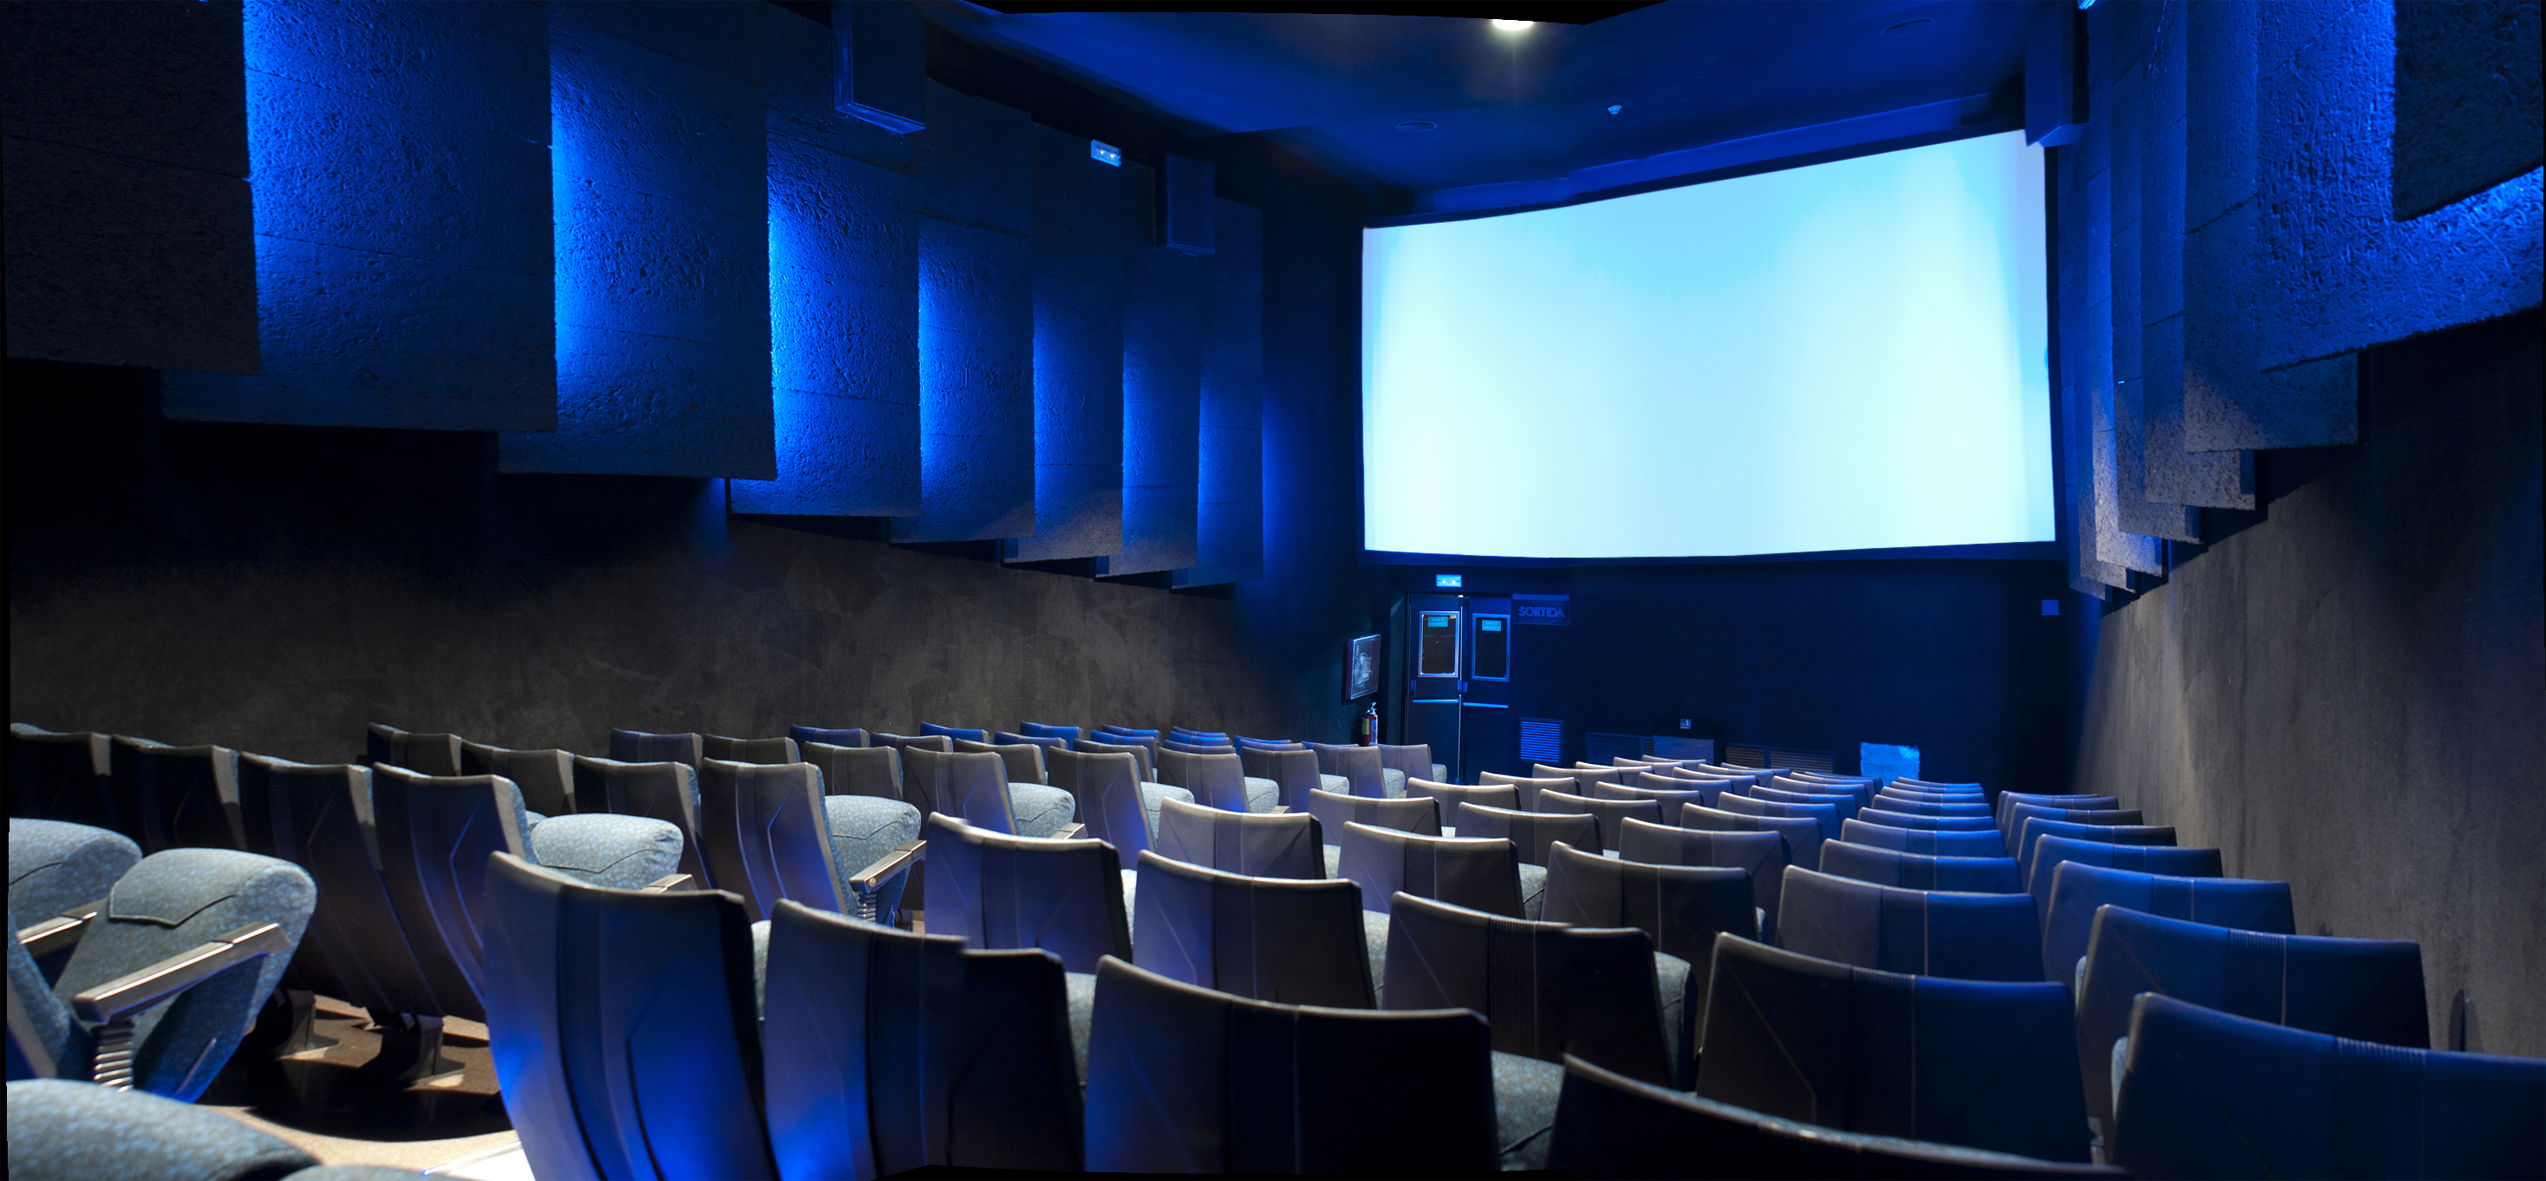 Comedia comunicaci n media cines girona cine - Fotos de salas de cine ...